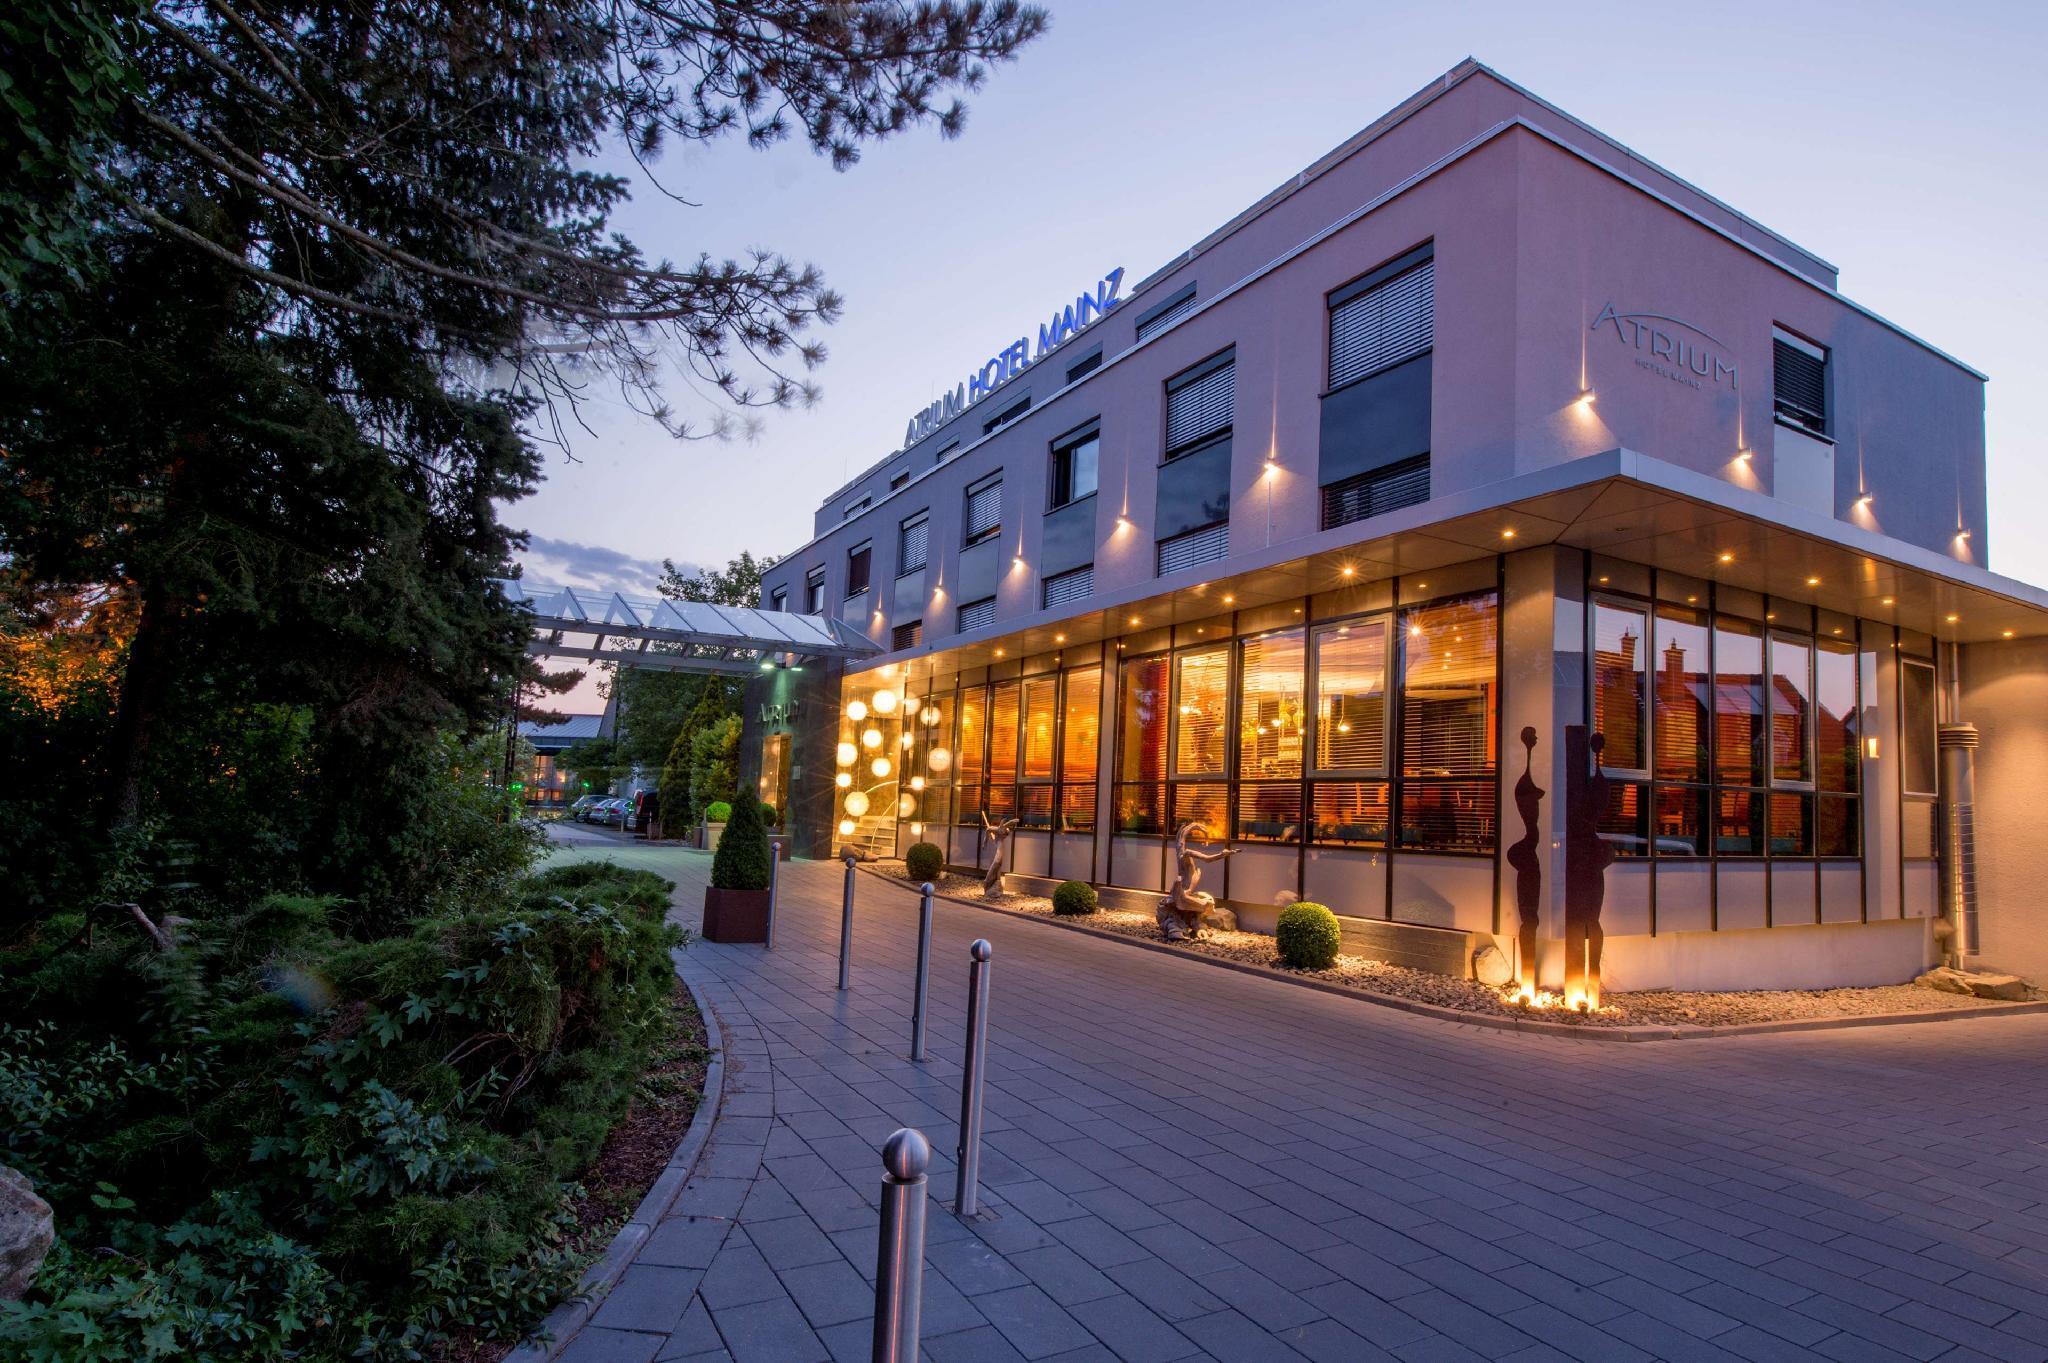 Atrium Hotel Mainz Germany 2019 Reviews Pictures Deals